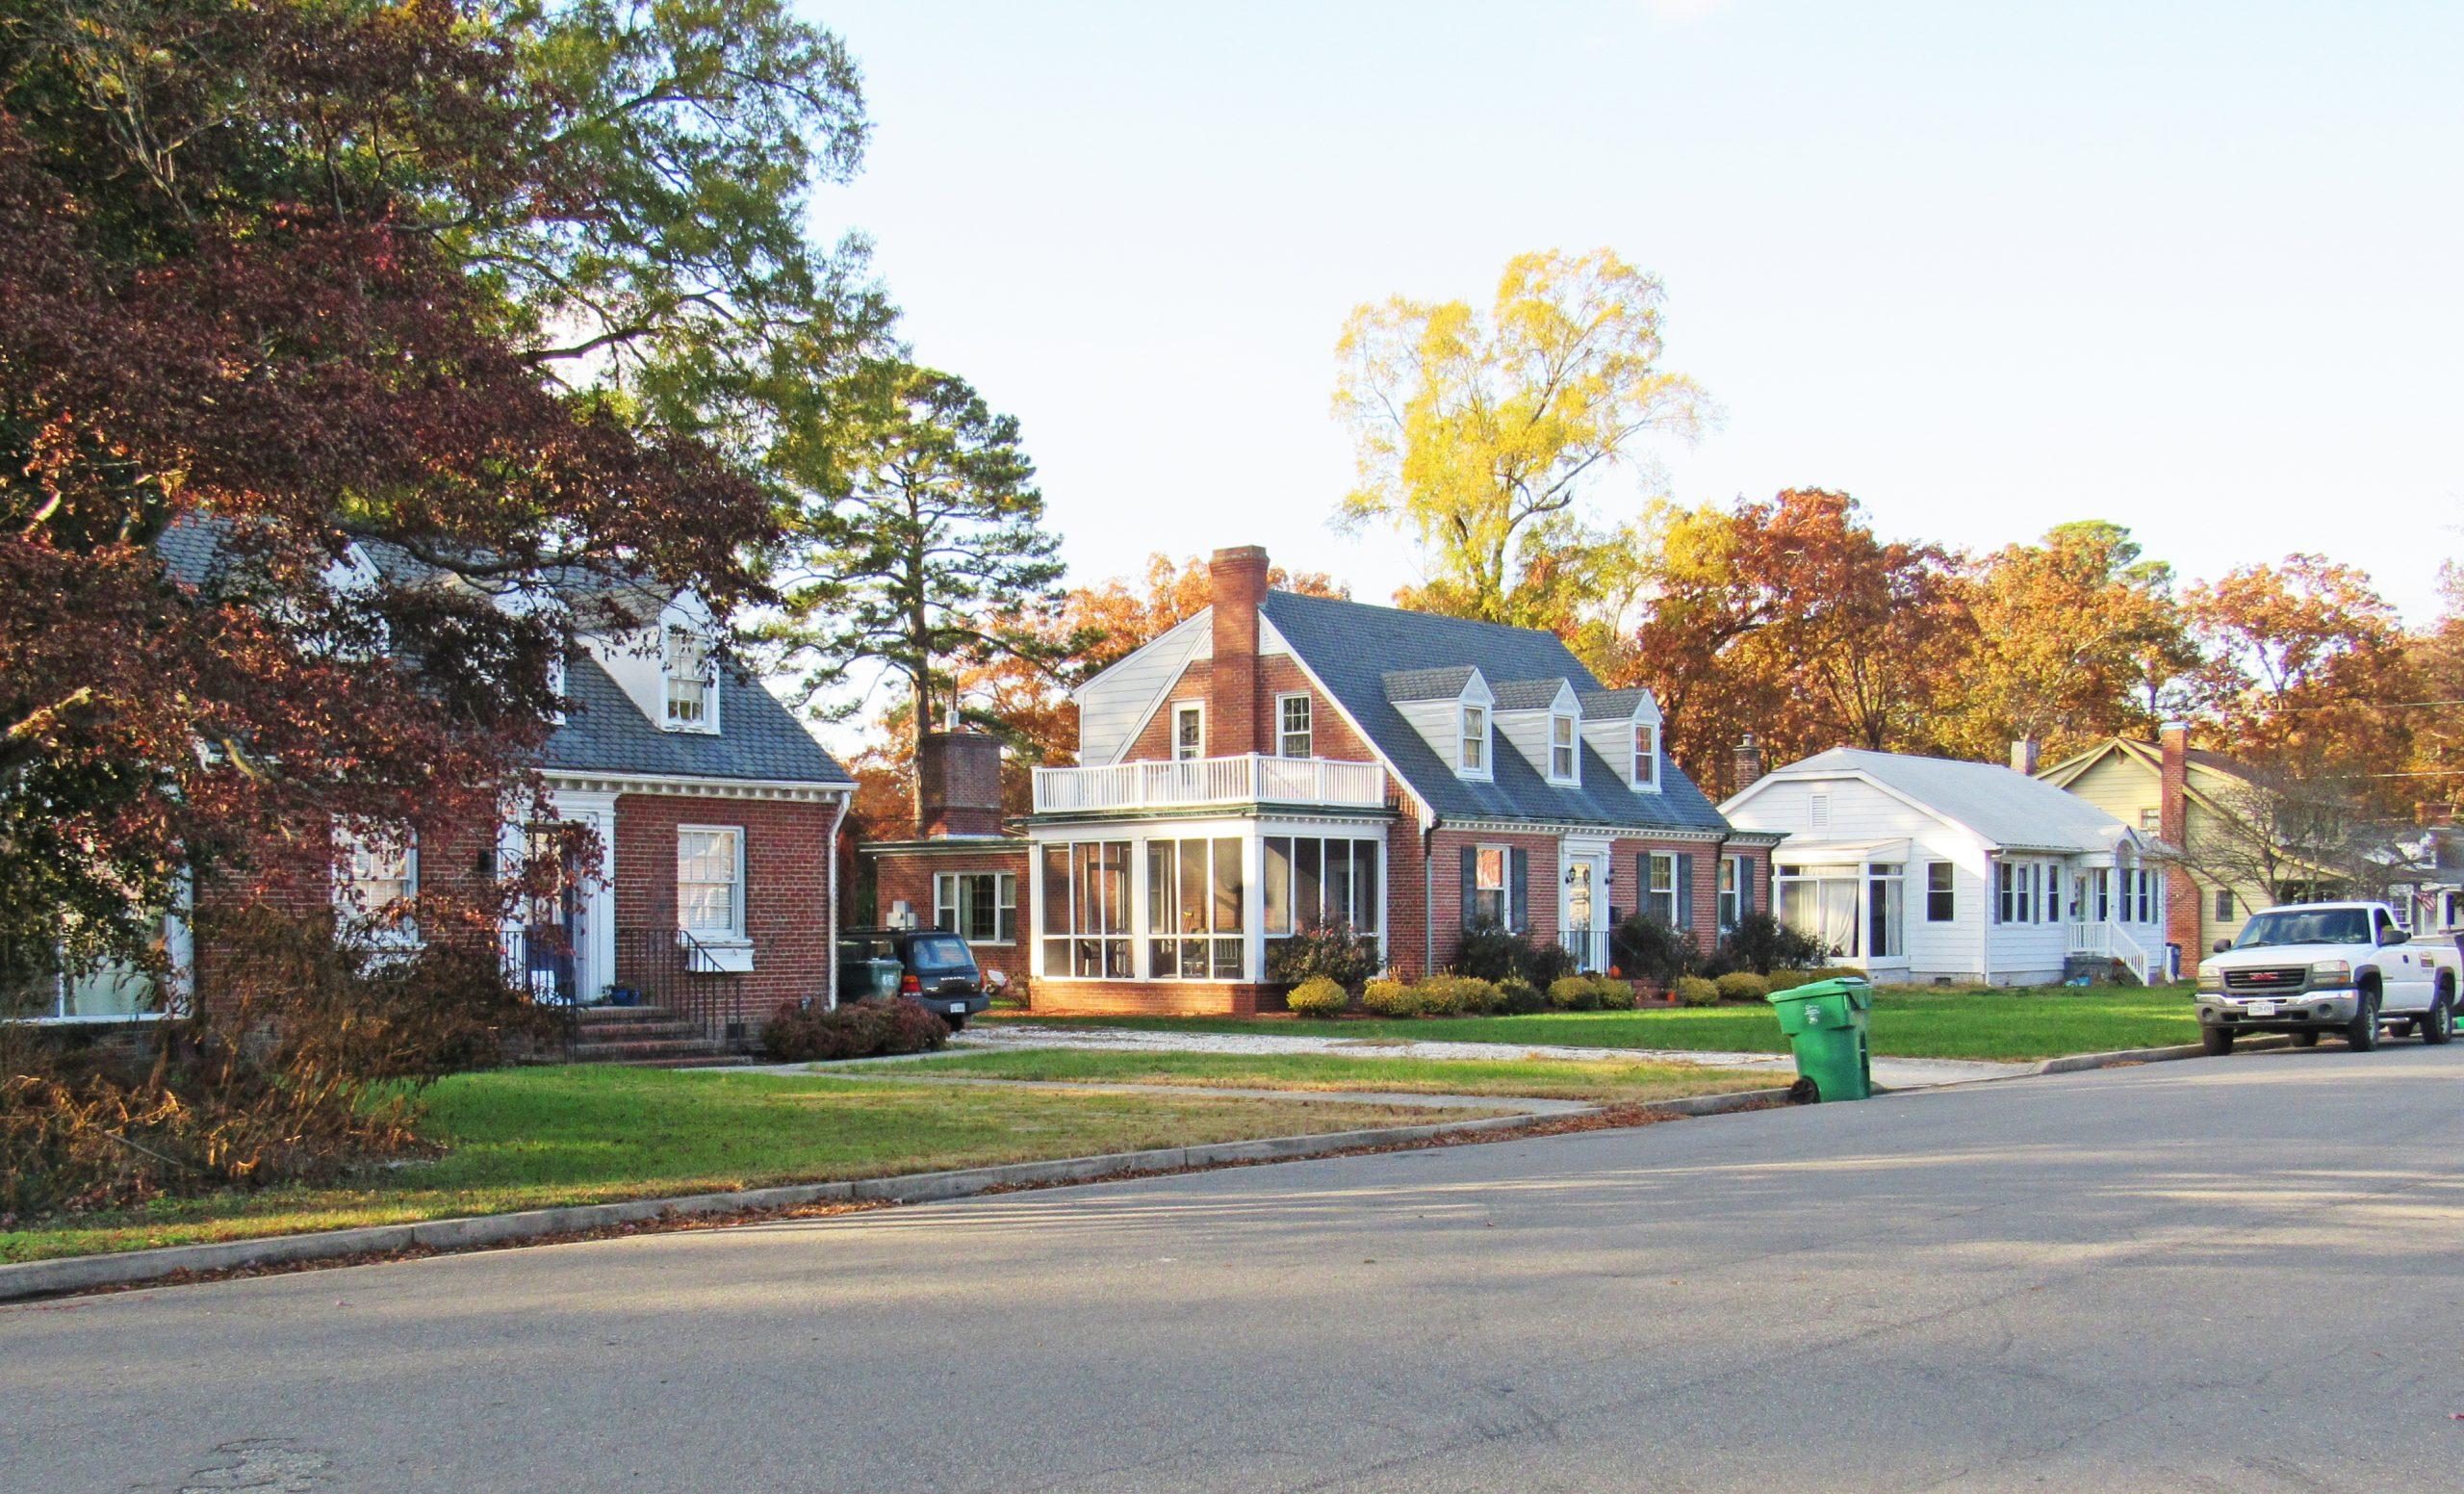 Fairfield-Sandston Historic District